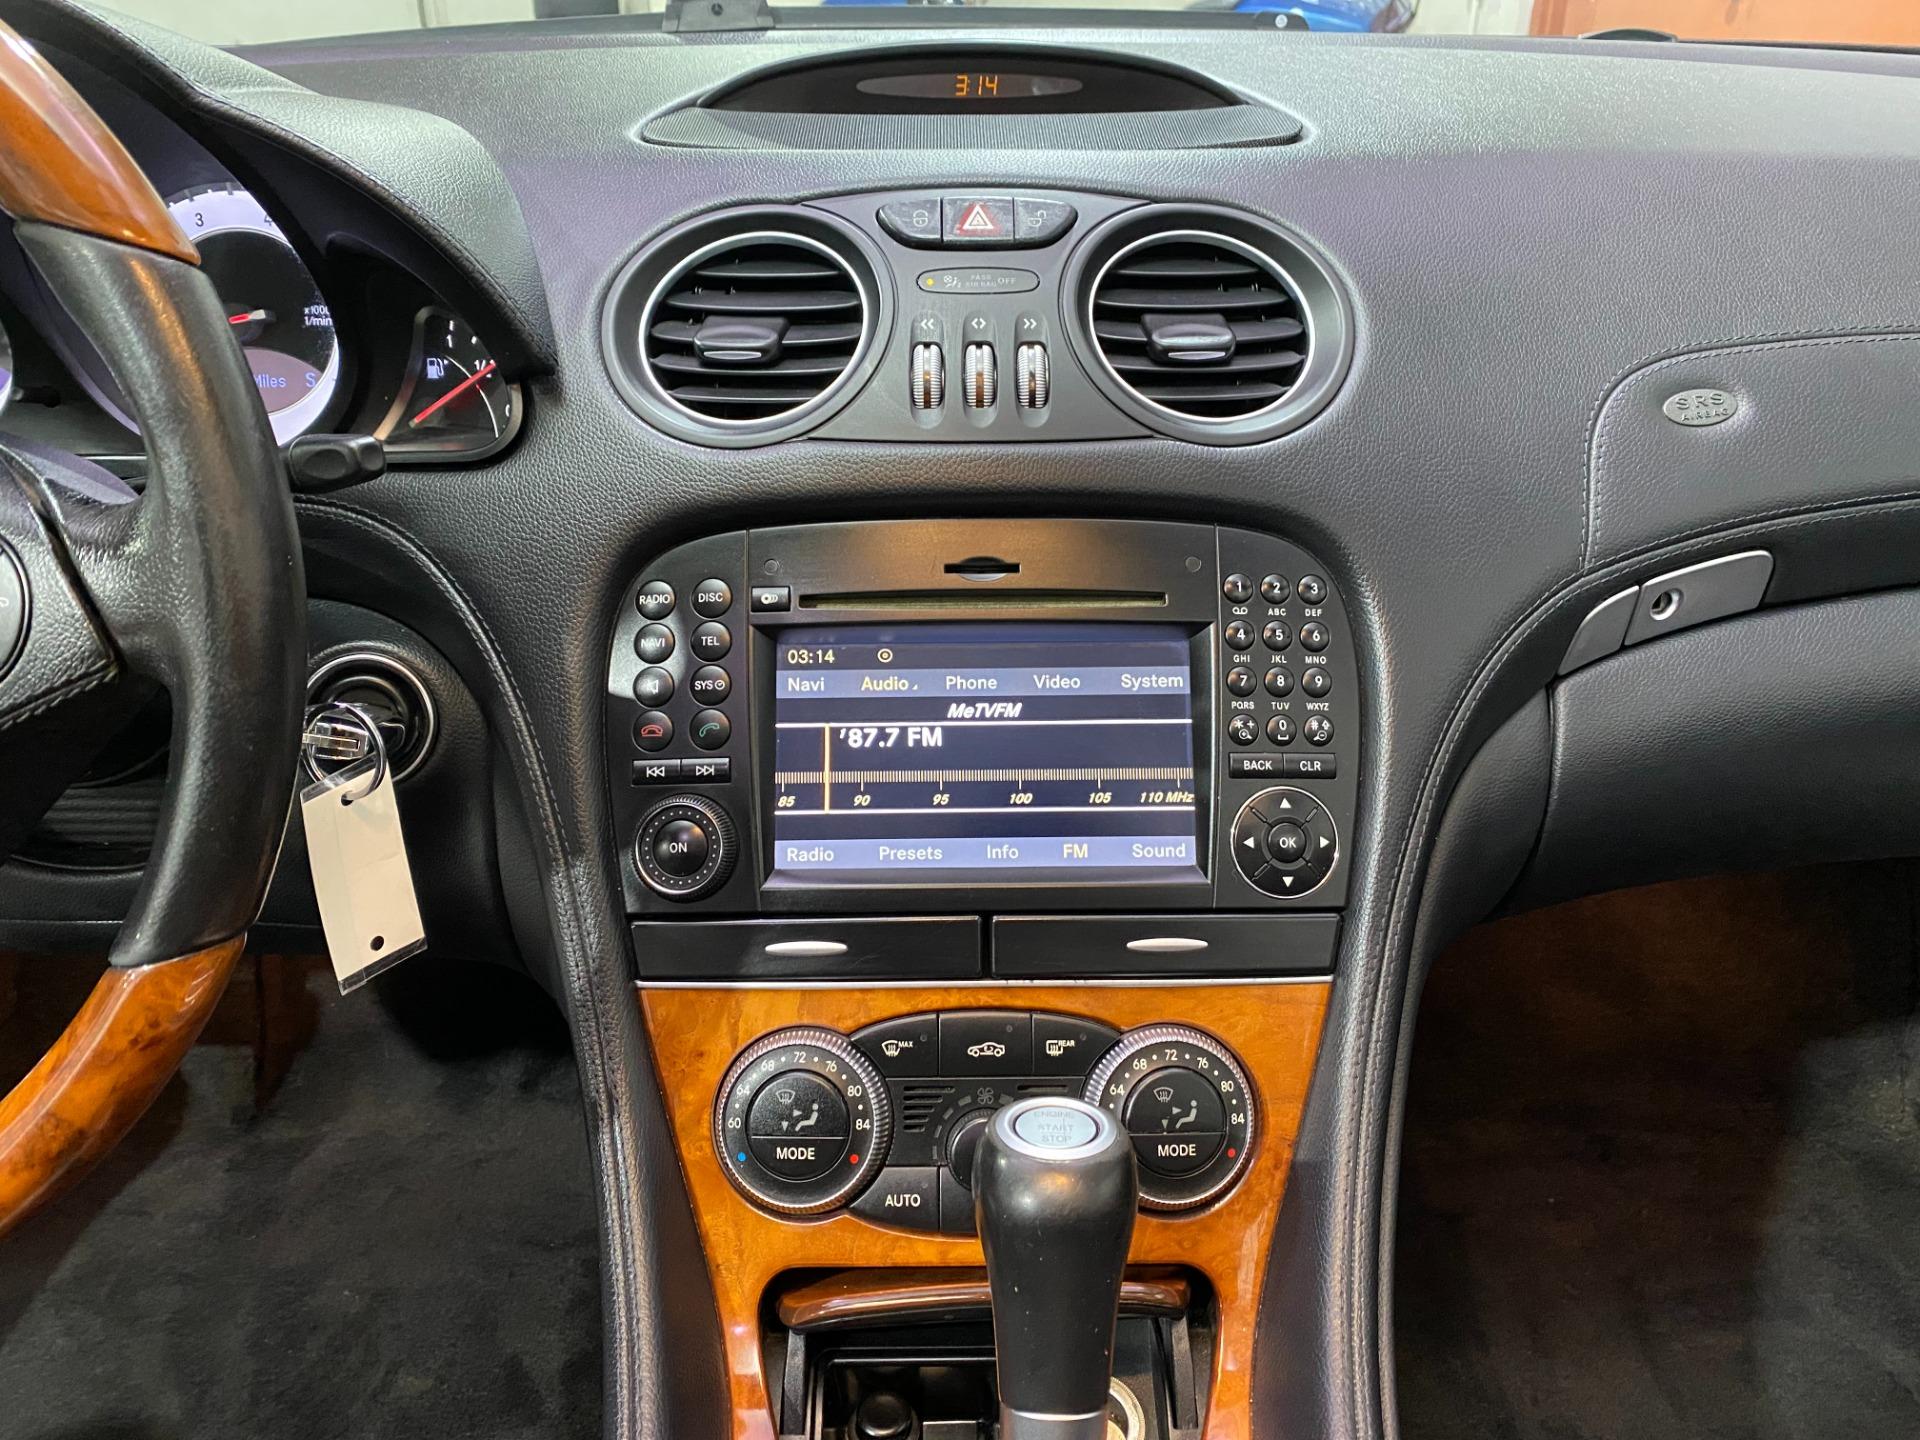 Used-2009-Mercedes-Benz-SL-Class-SL-550-Convertible-RWD